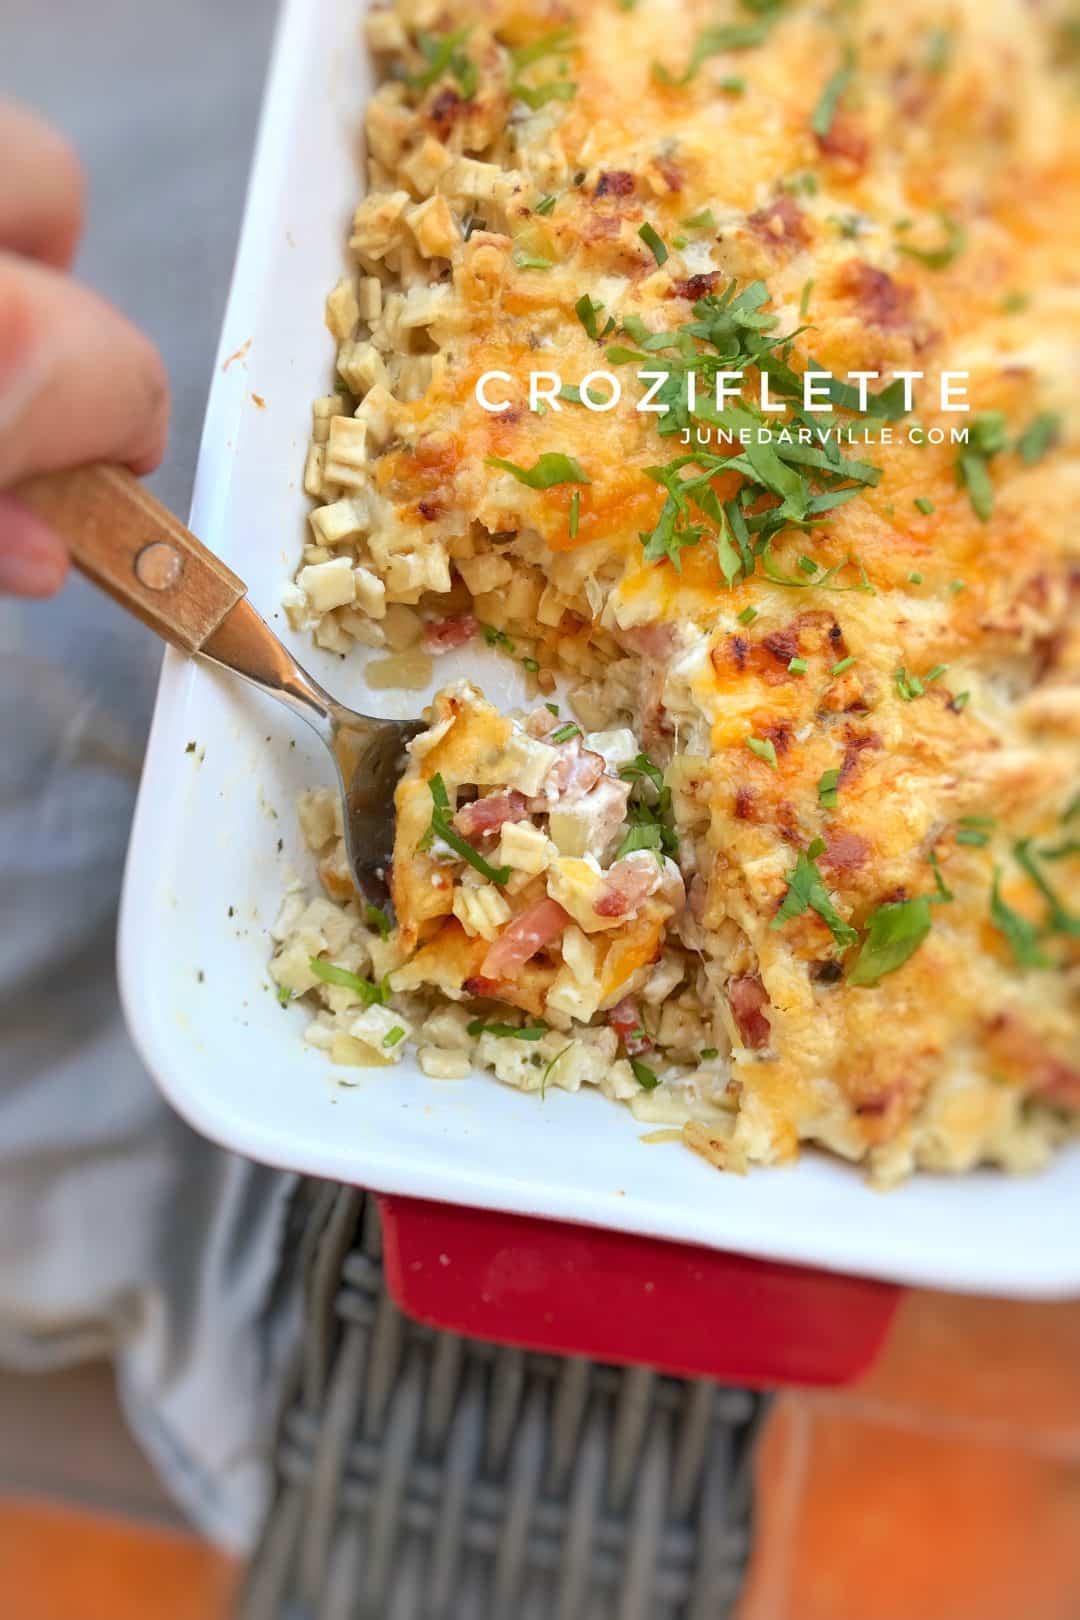 Croziflette, French Pasta Bake with Bacon & Reblochon